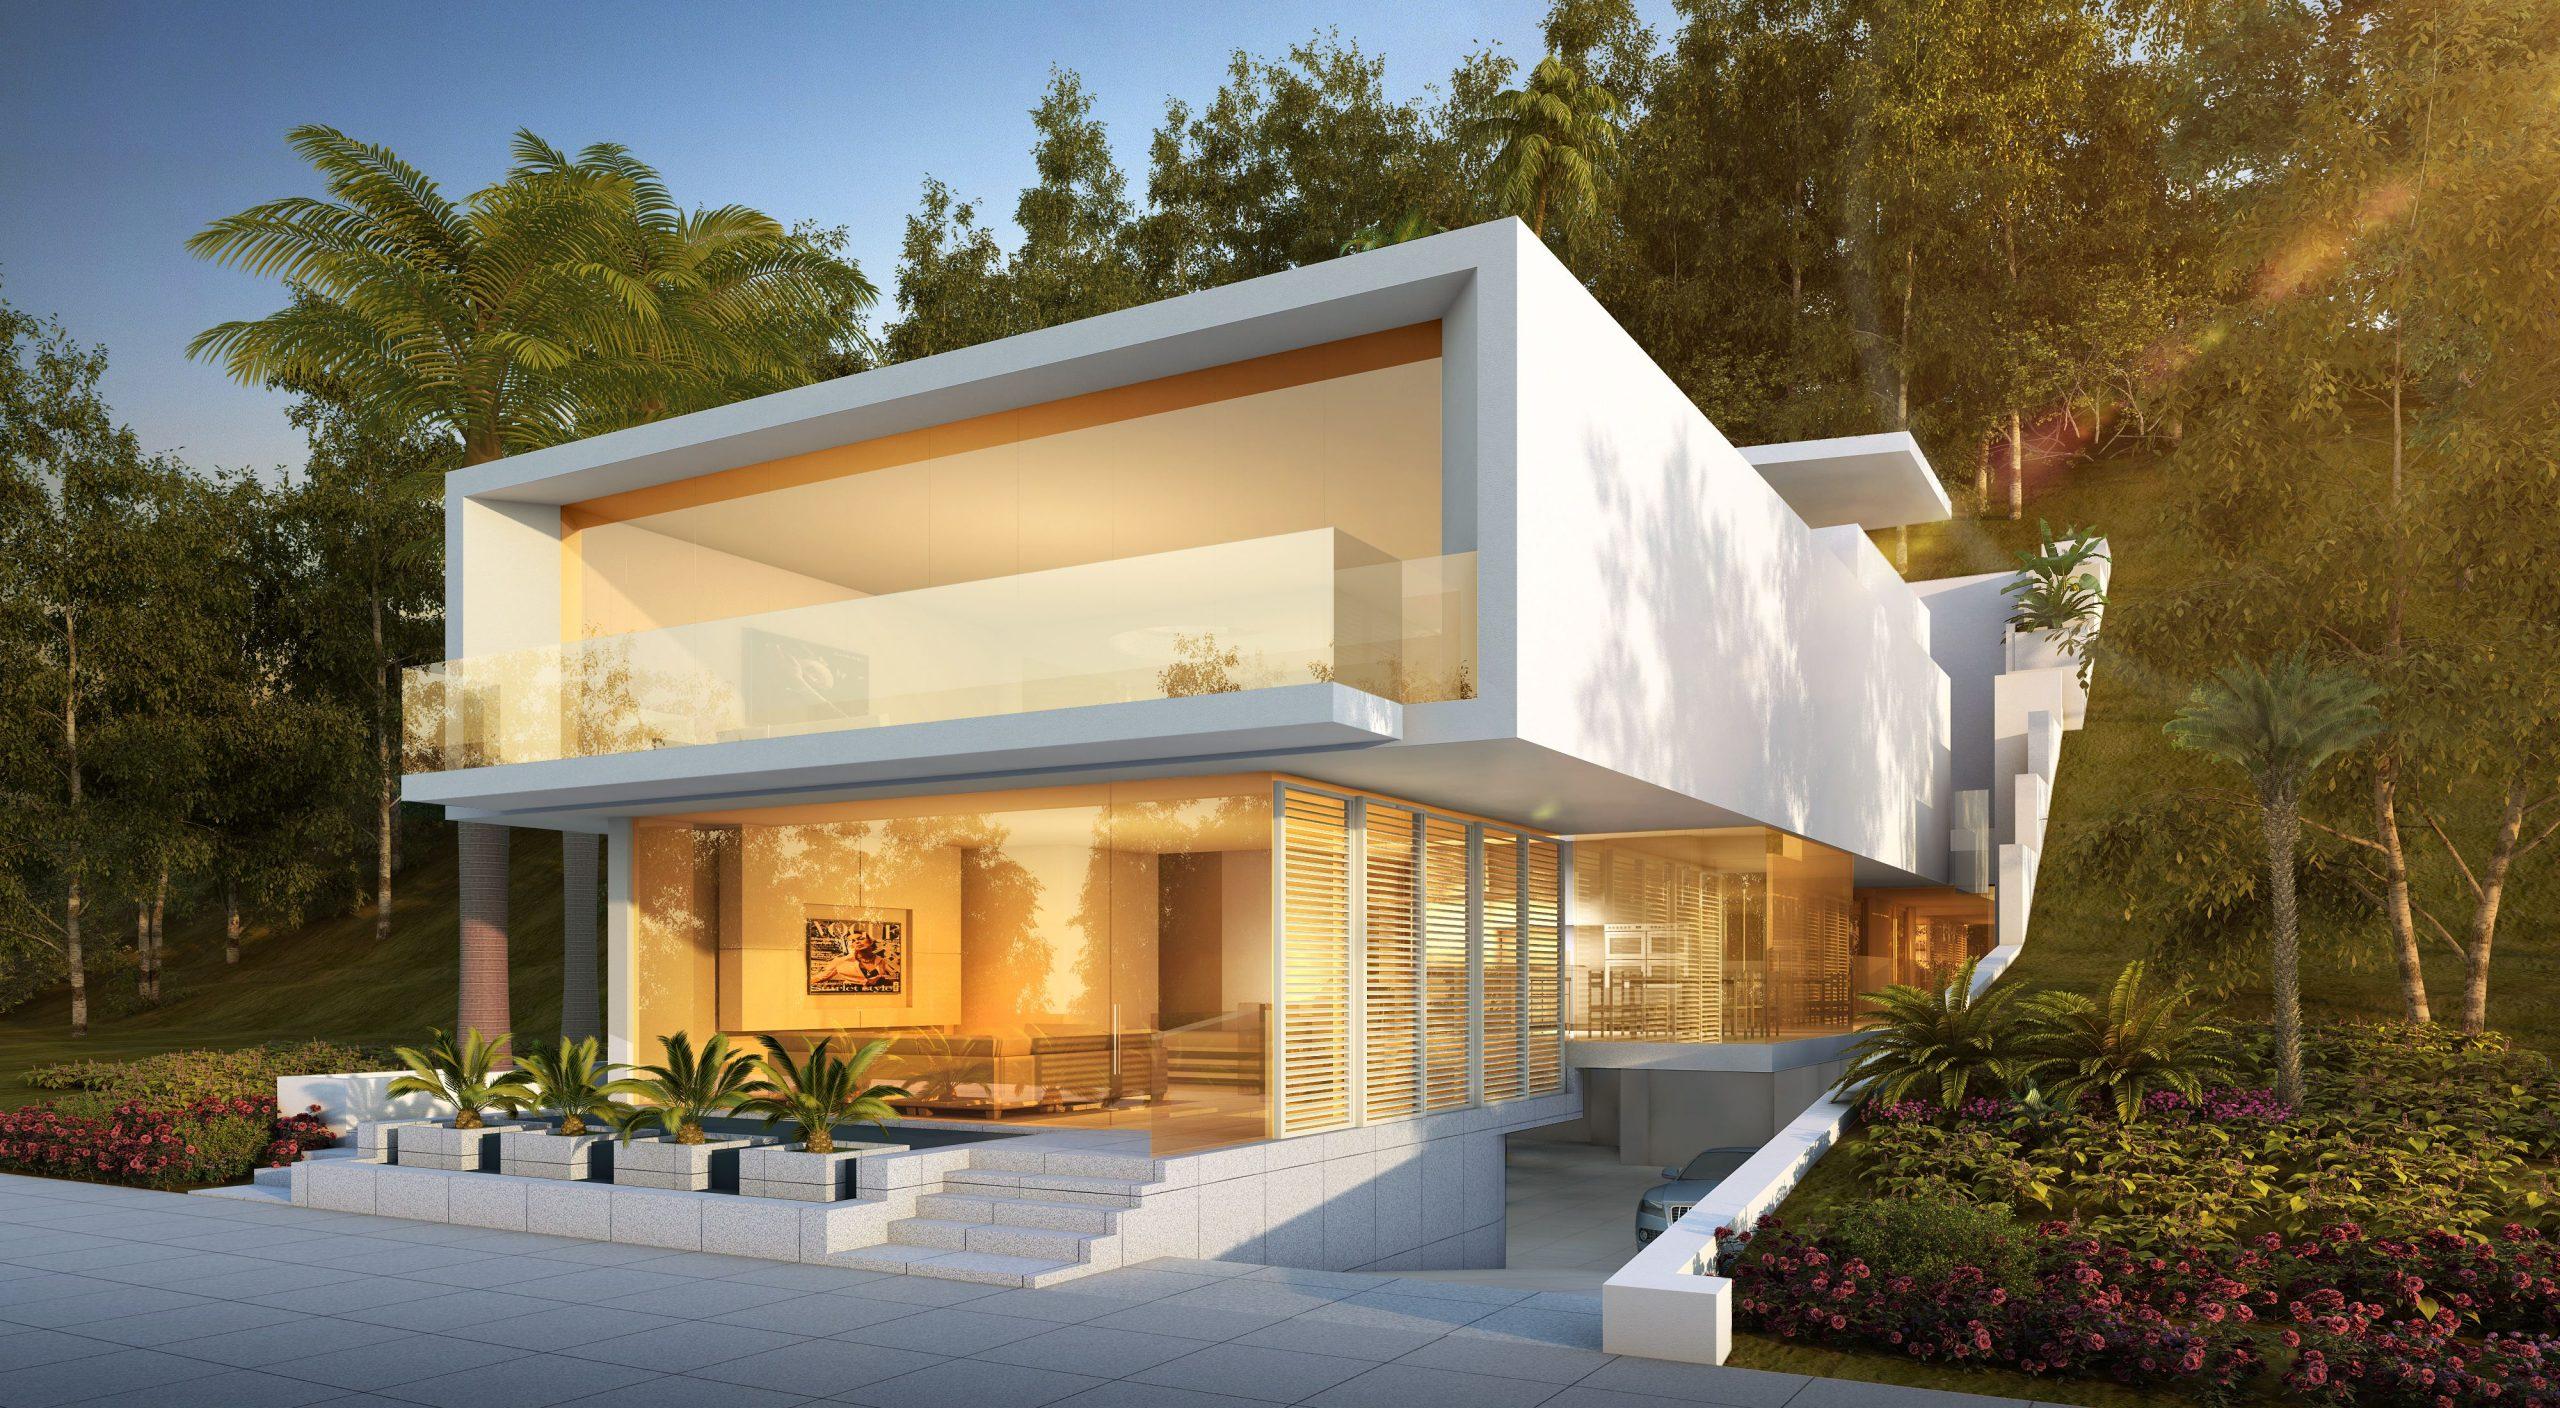 Architect Orange County - Architect Newport Beach - Architect Laguna Beach - Romantic Modernism - Geoff Sumich